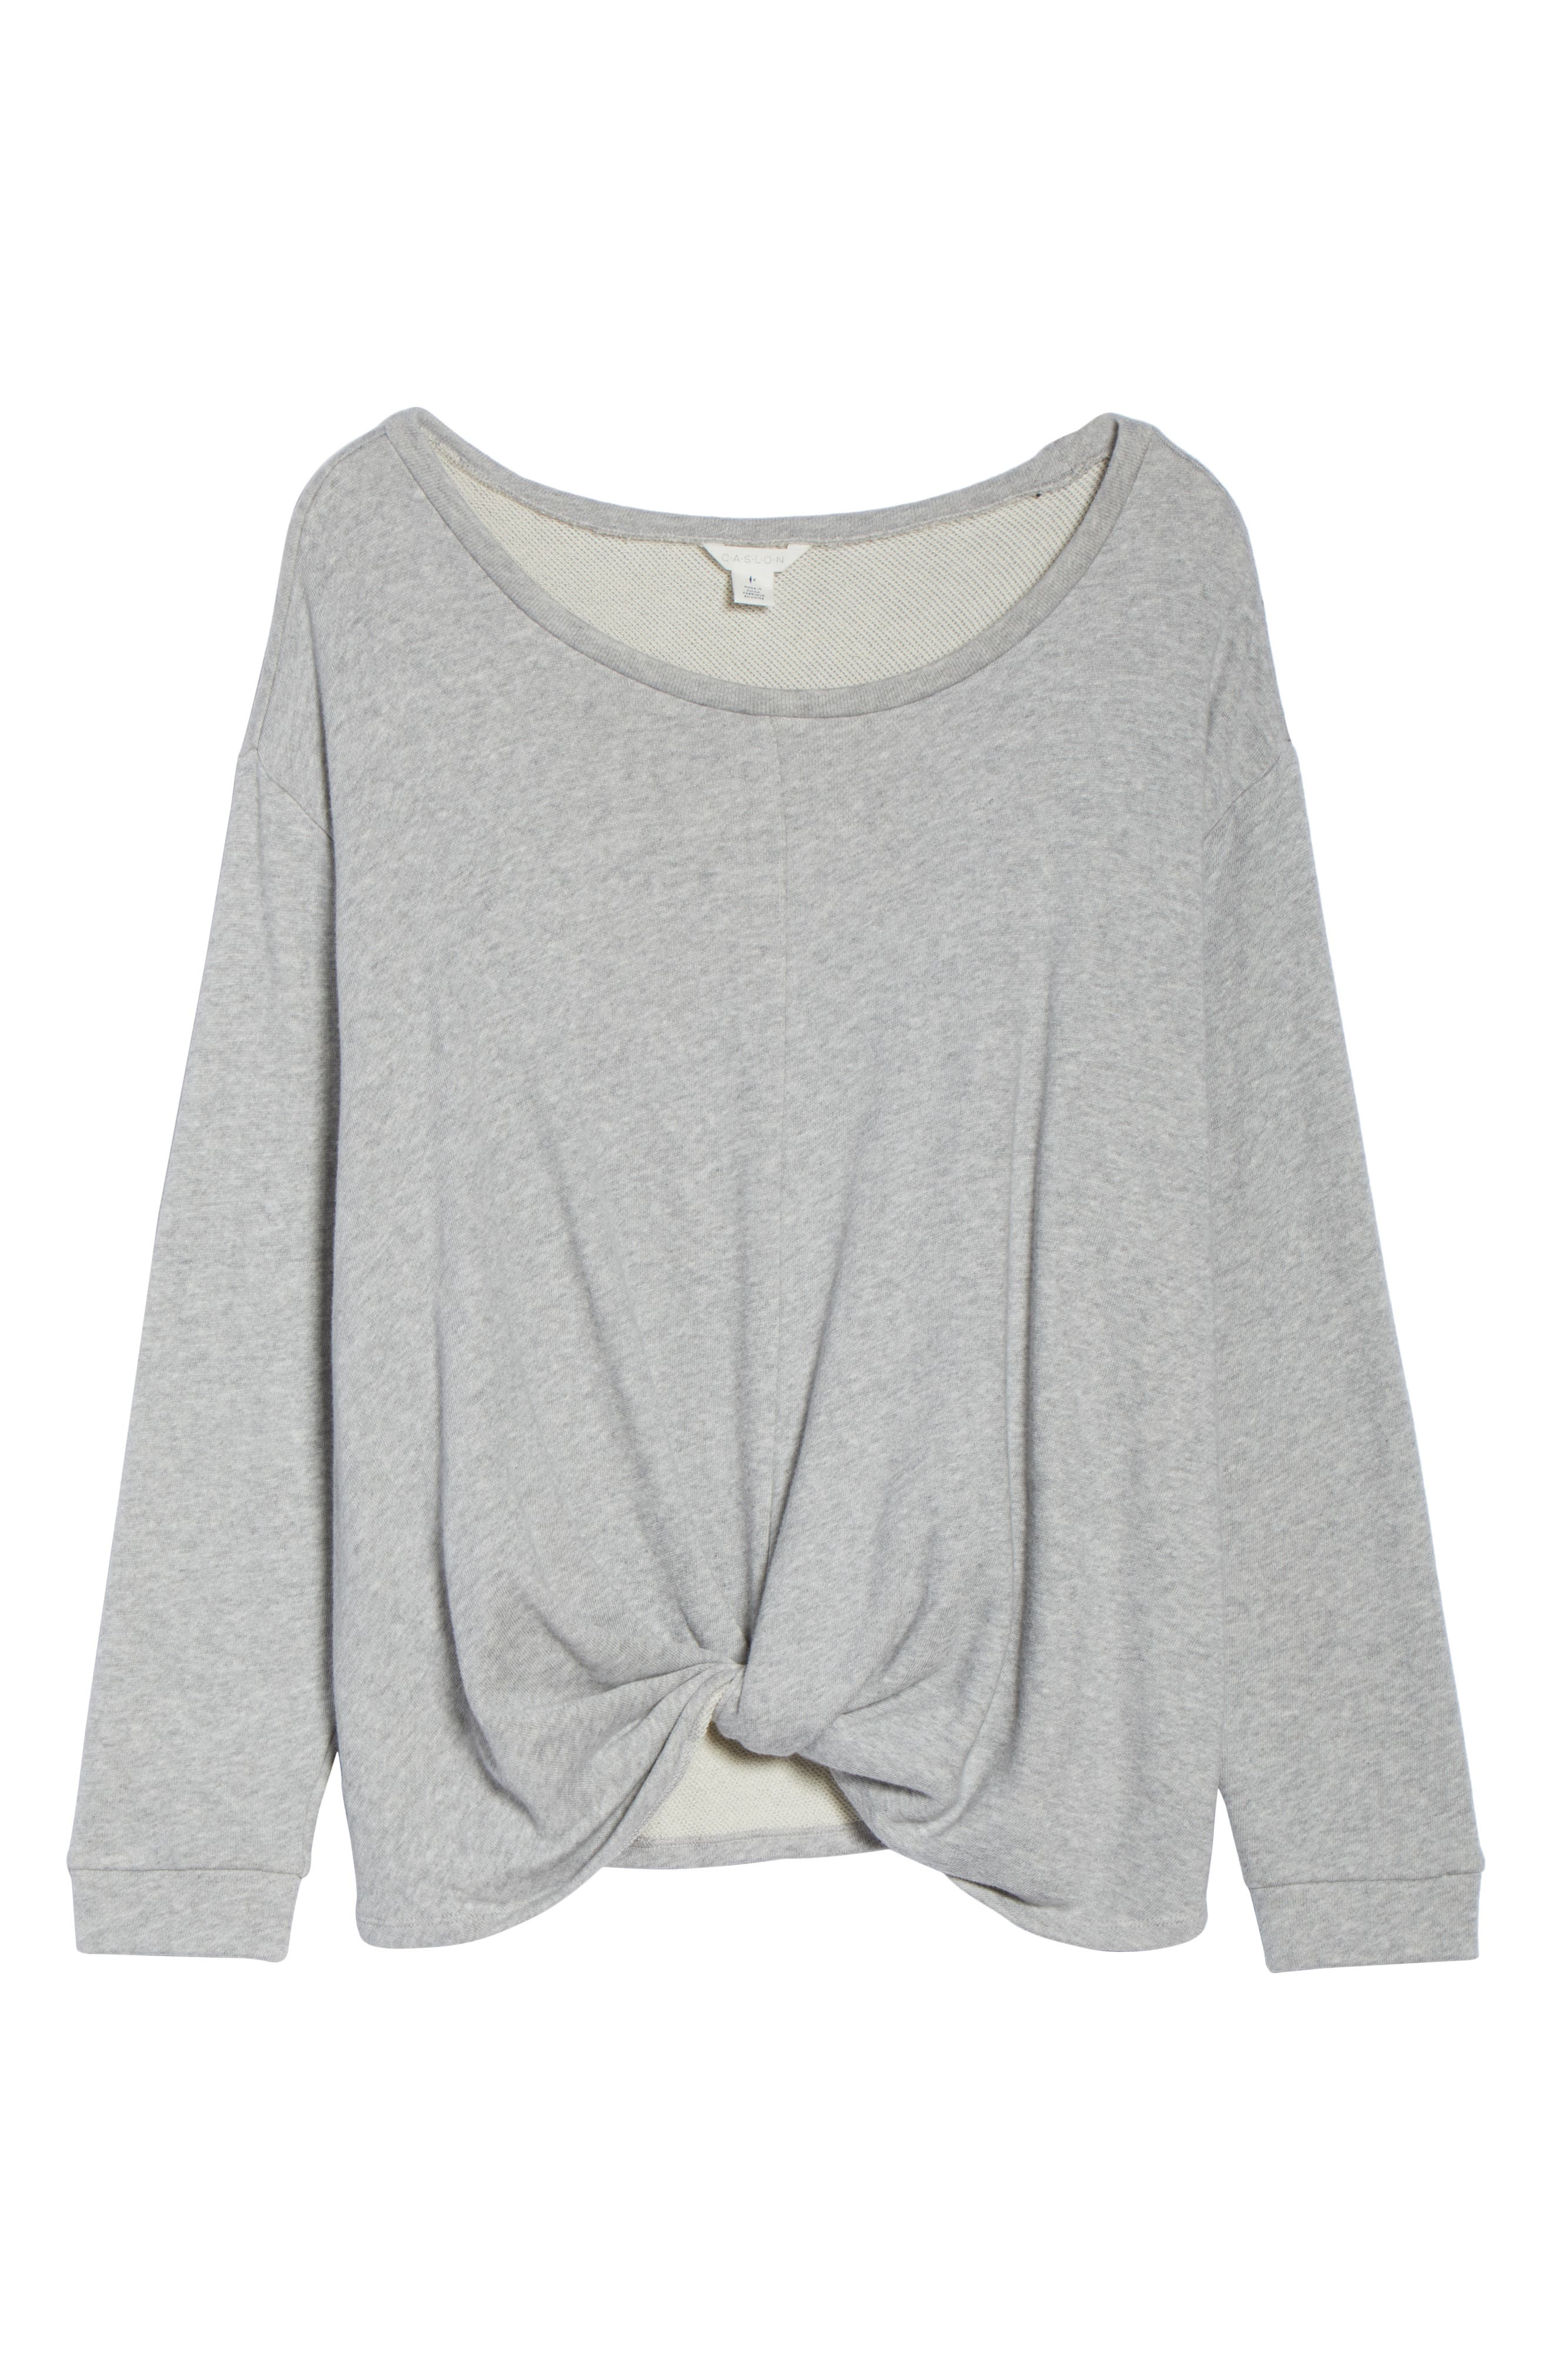 Twist Front Sweatshirt,                             Alternate thumbnail 6, color,                             GREY HEATHER